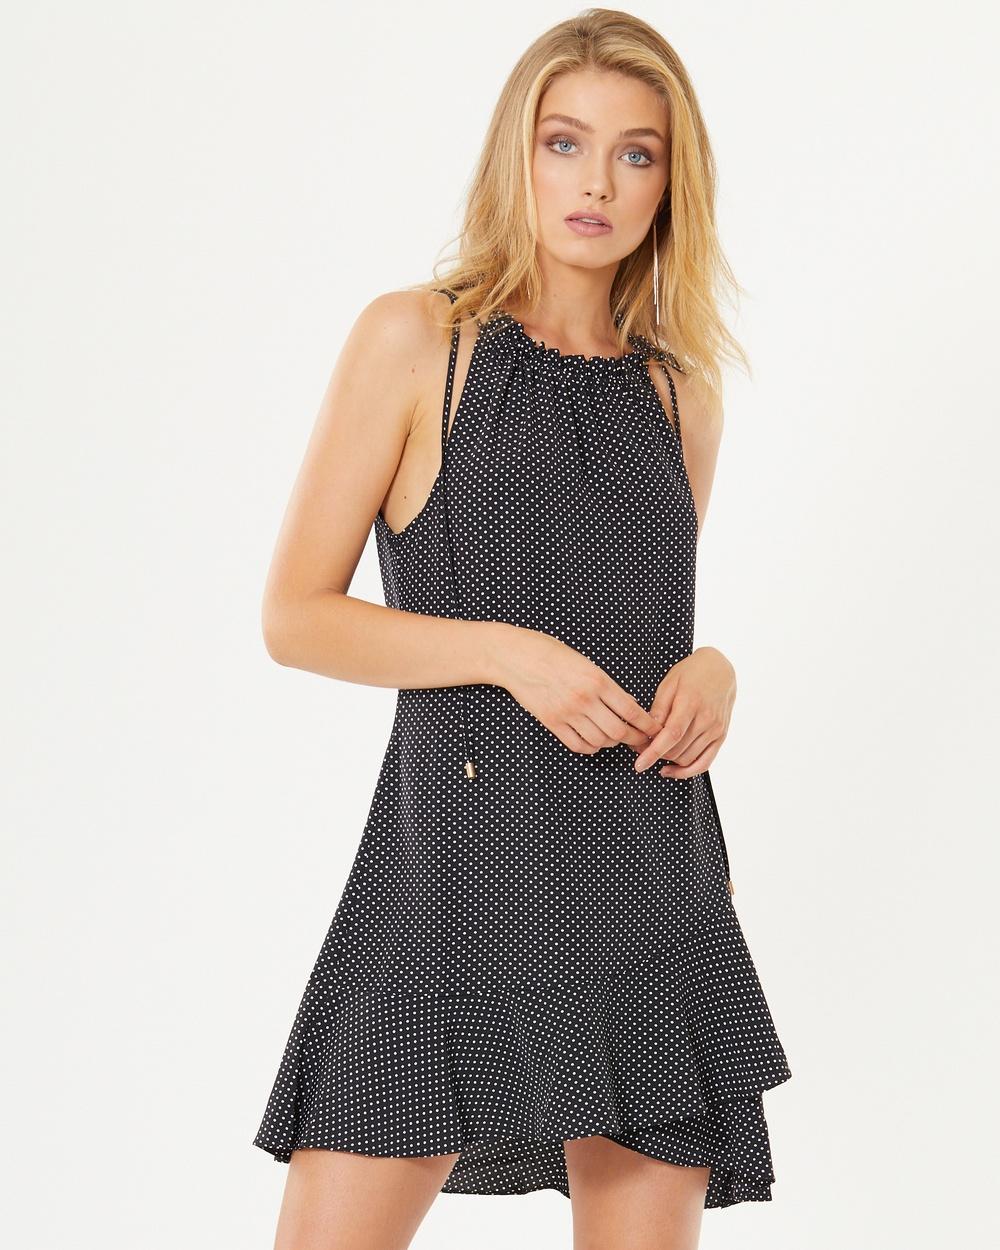 Tussah Francisco Swing Dress Dresses Black Polka Dots Francisco Swing Dress